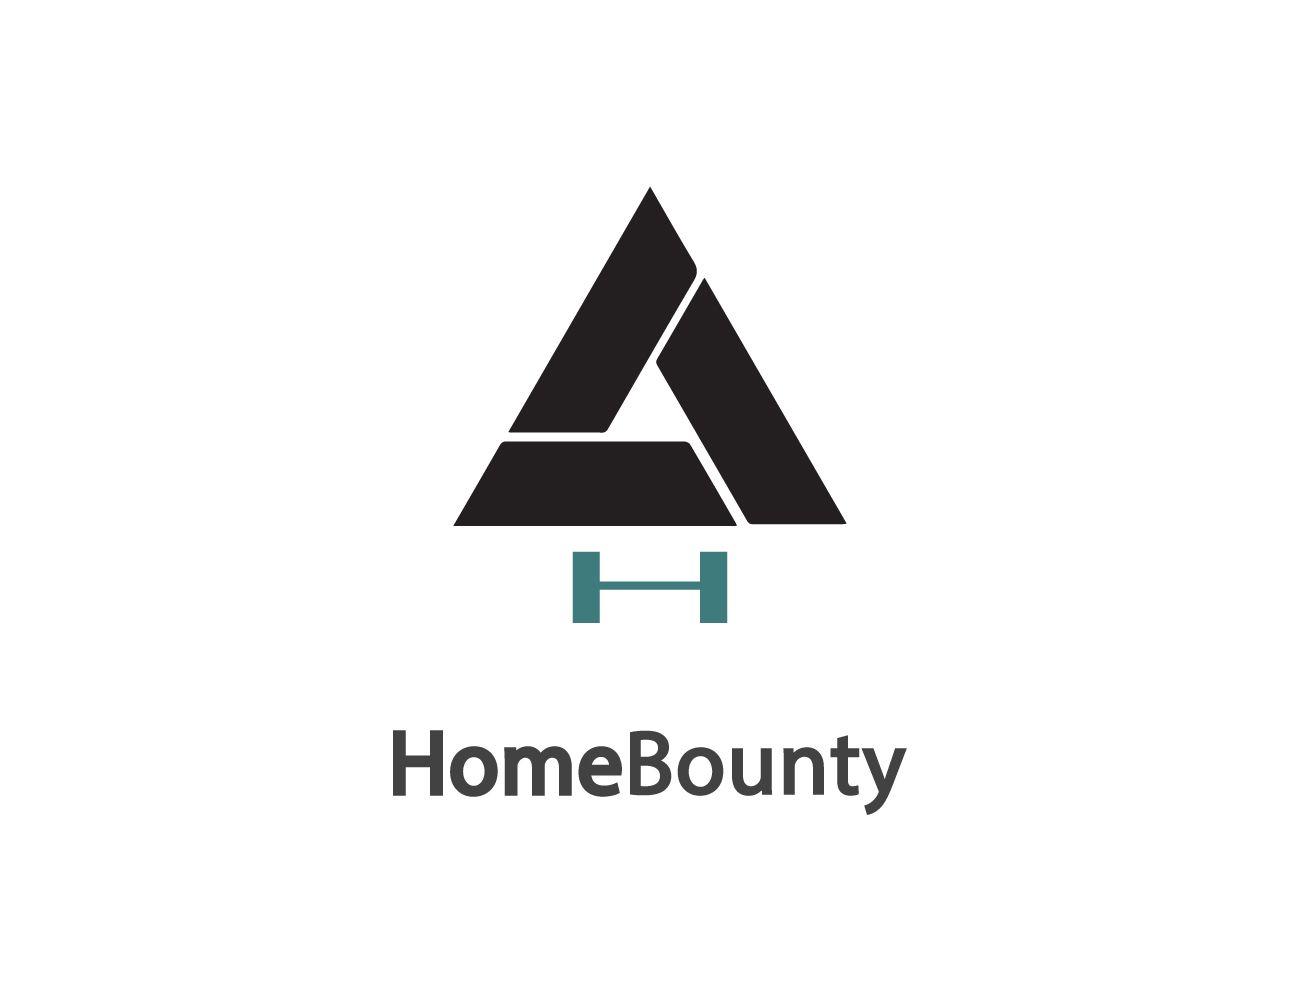 Design A Clever Logo For Homebounty